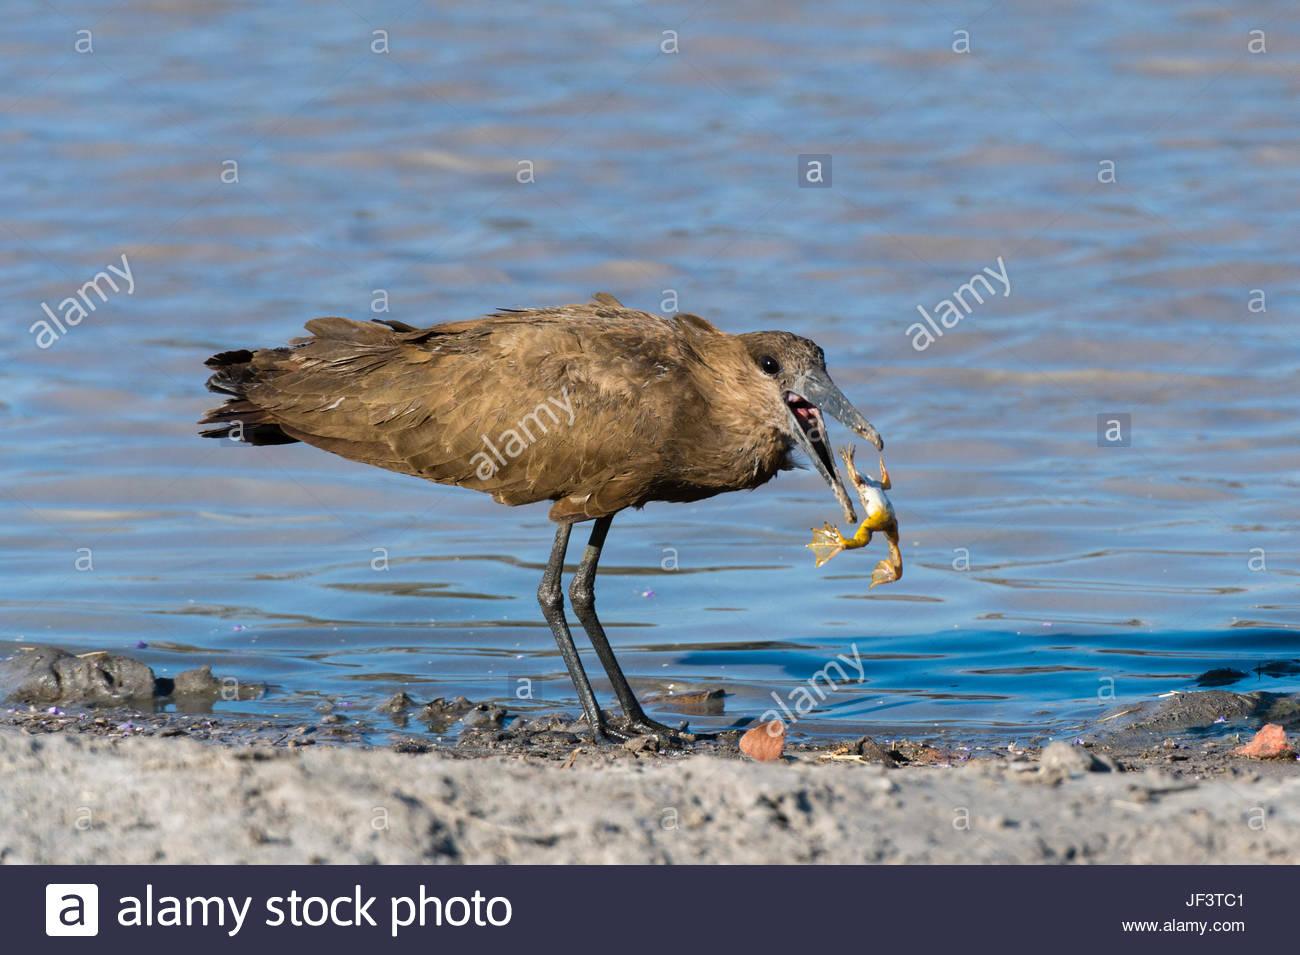 A hammerkop, Scopus umbretta, feeding on a frog. - Stock Image